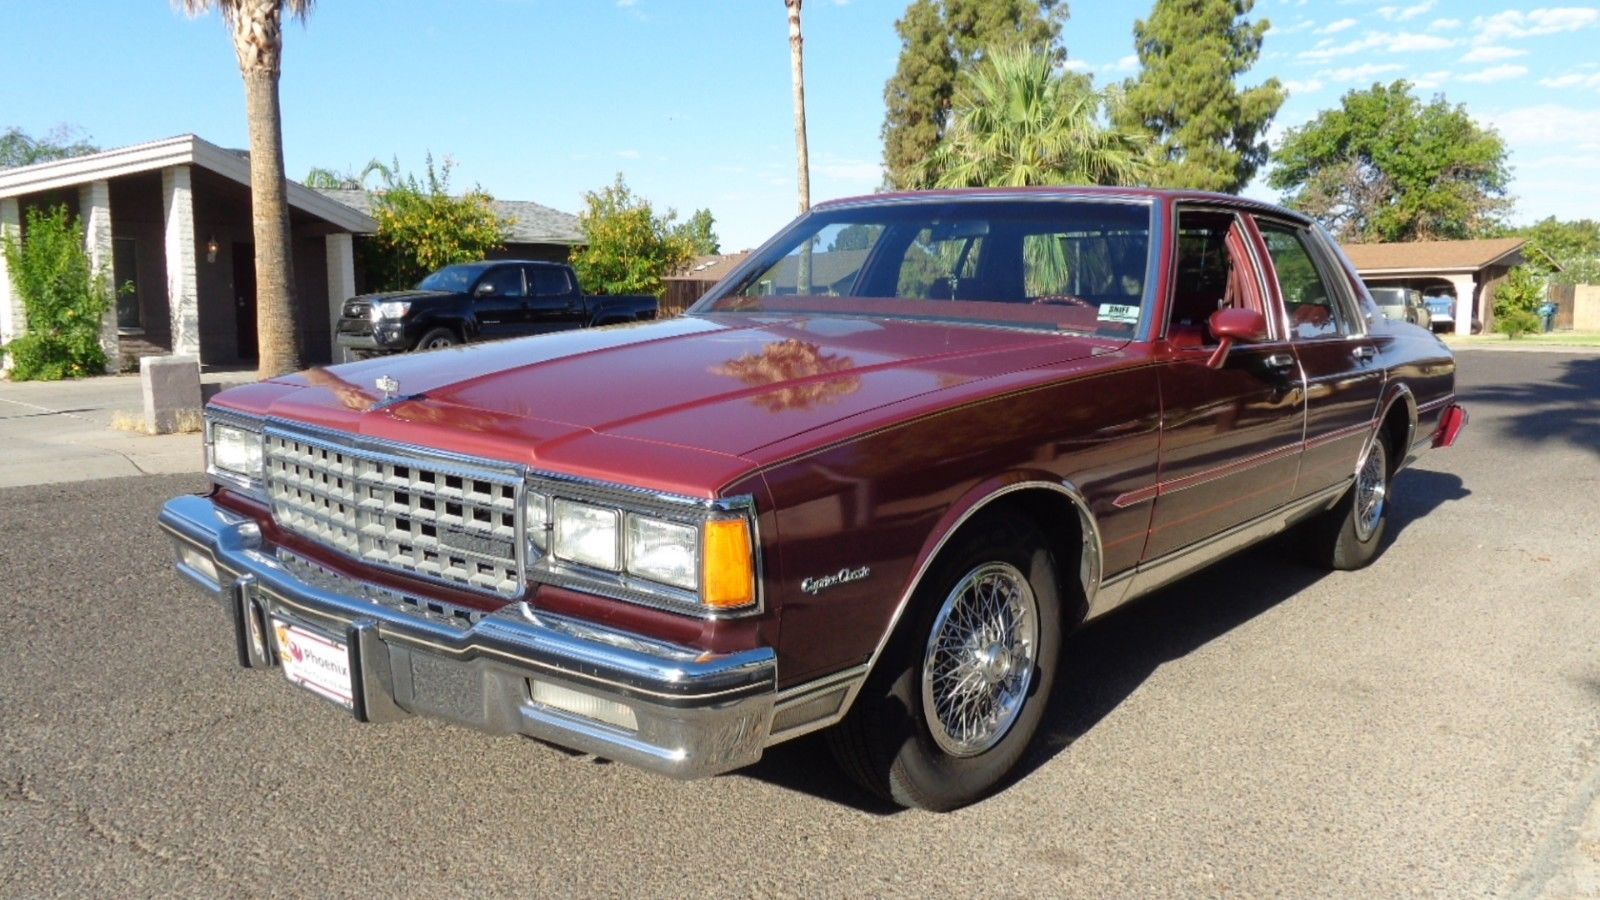 1984 Chevrolet Caprice $5051 50 for sale in Phoenix, AZ